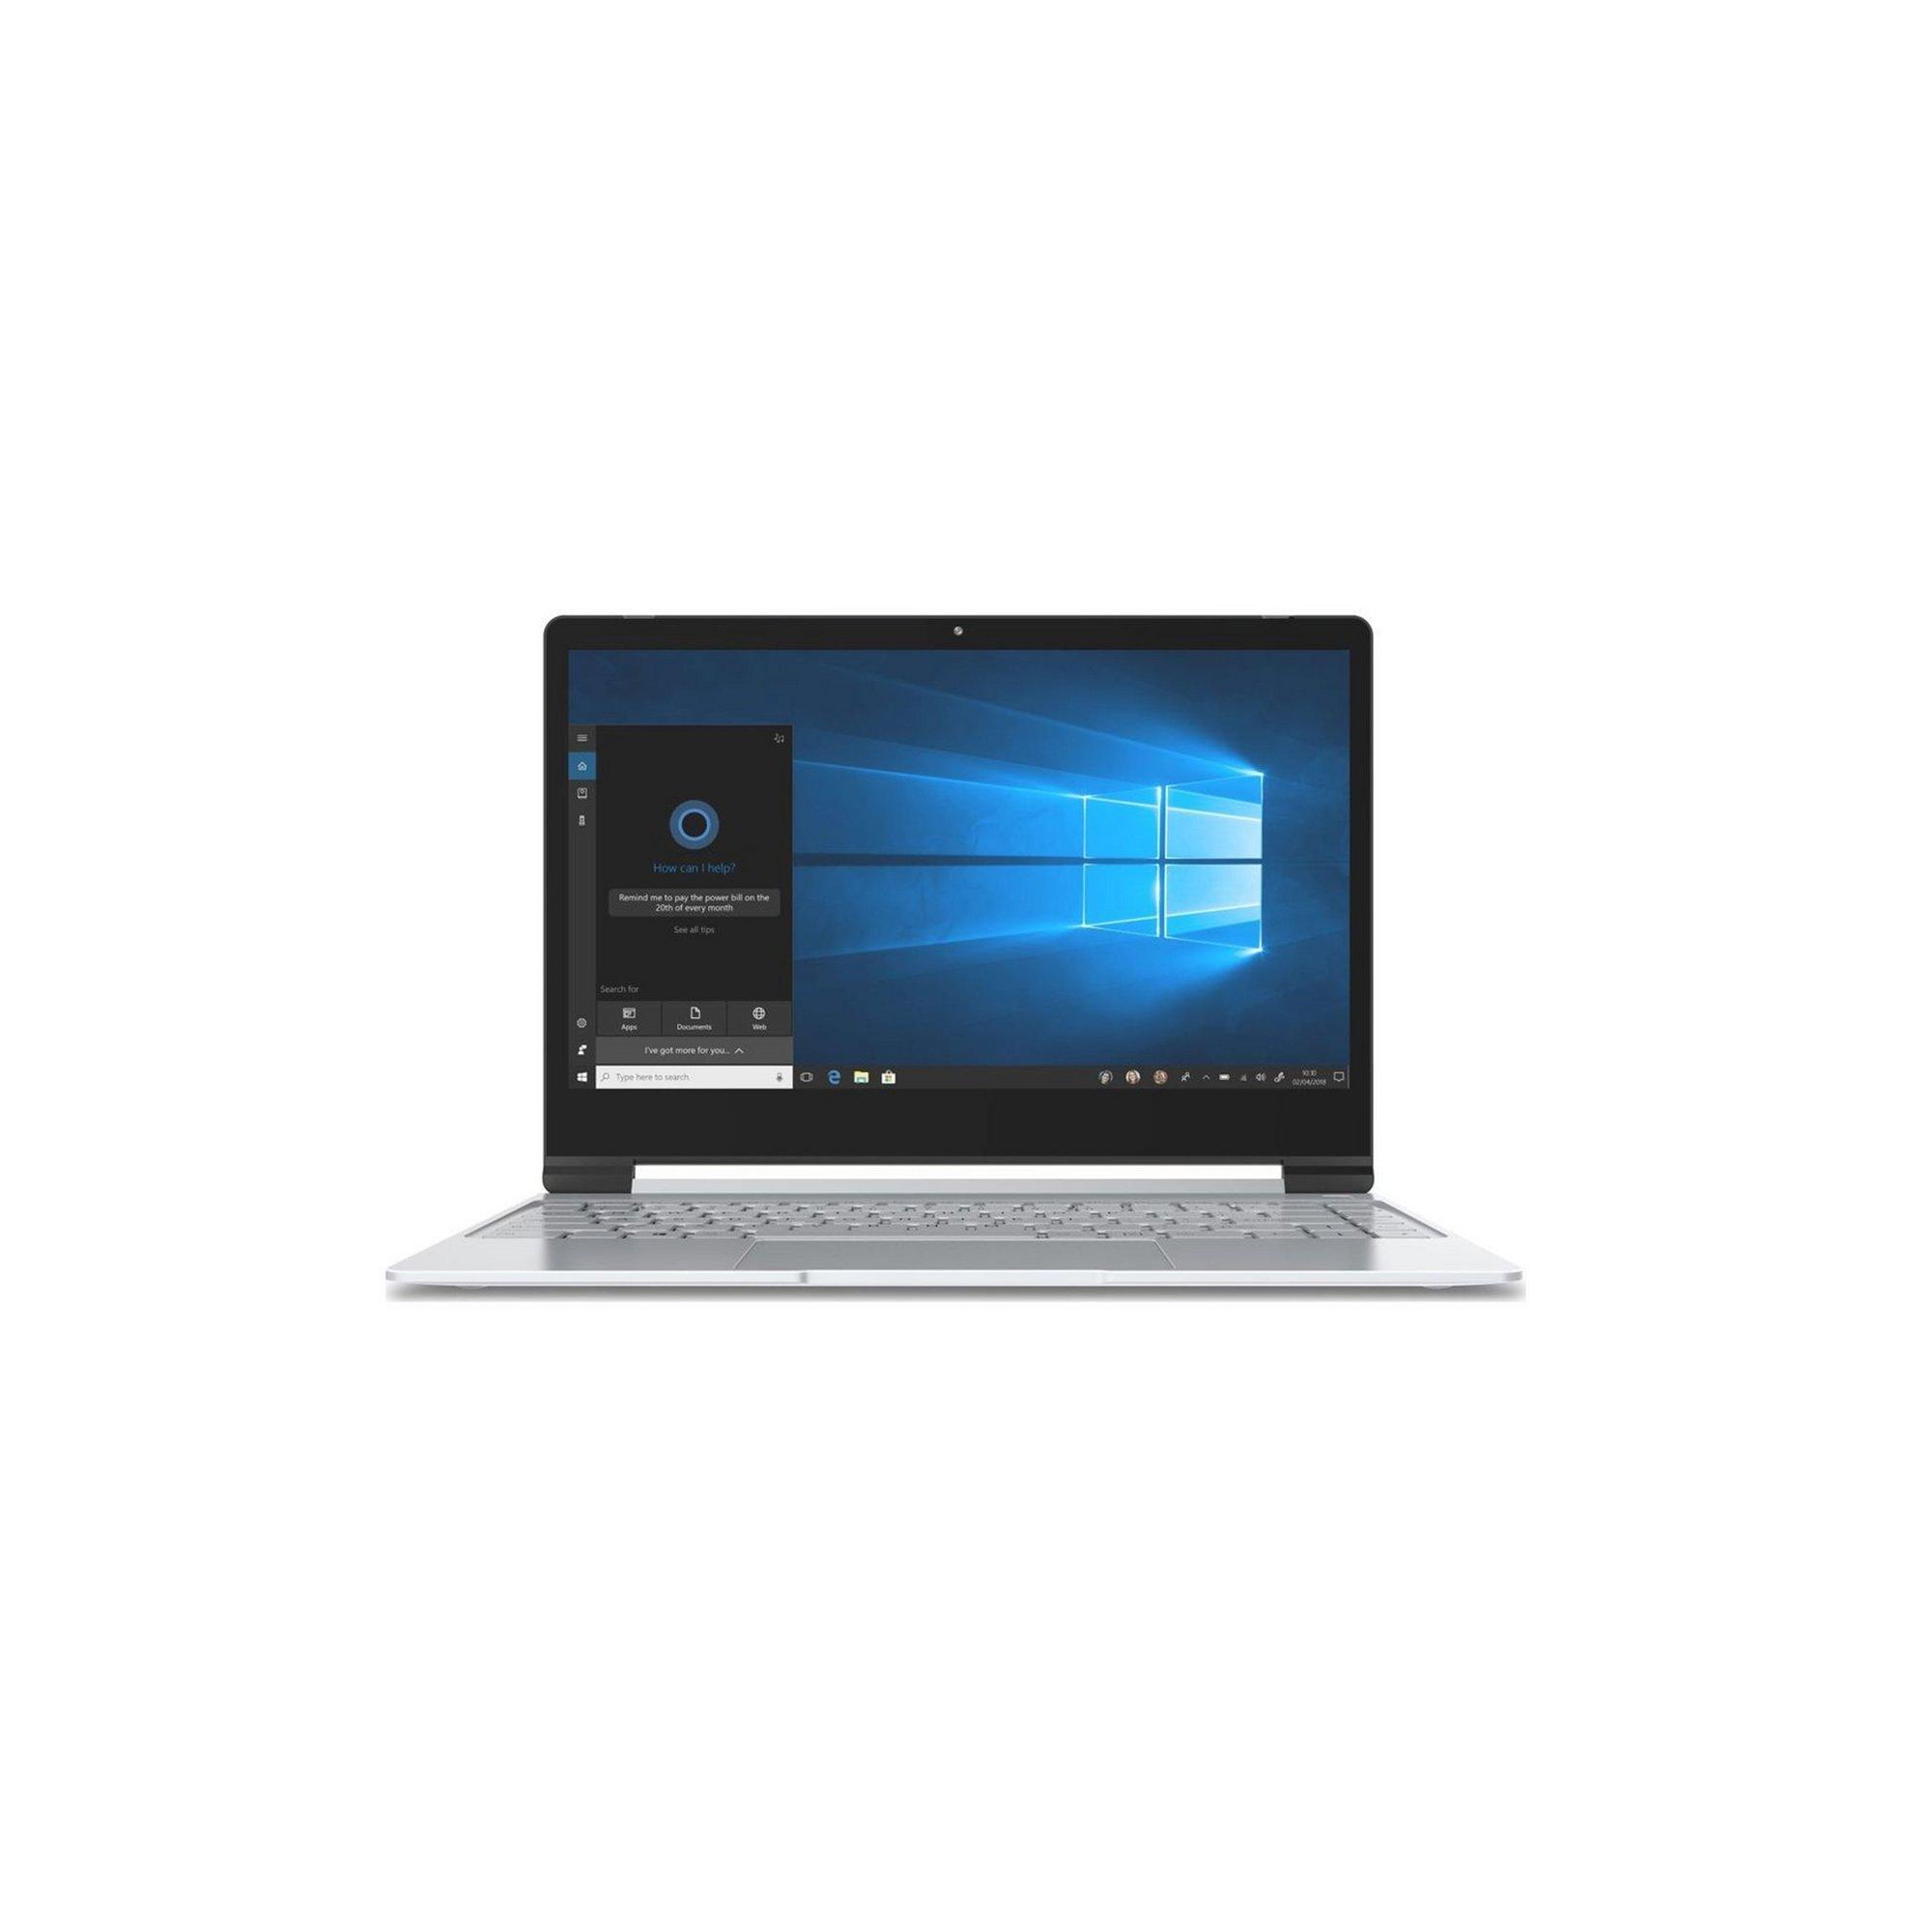 Image of GEO Book 3 13.3 Inch Intel Celeron Laptop - 64 GB eMMC